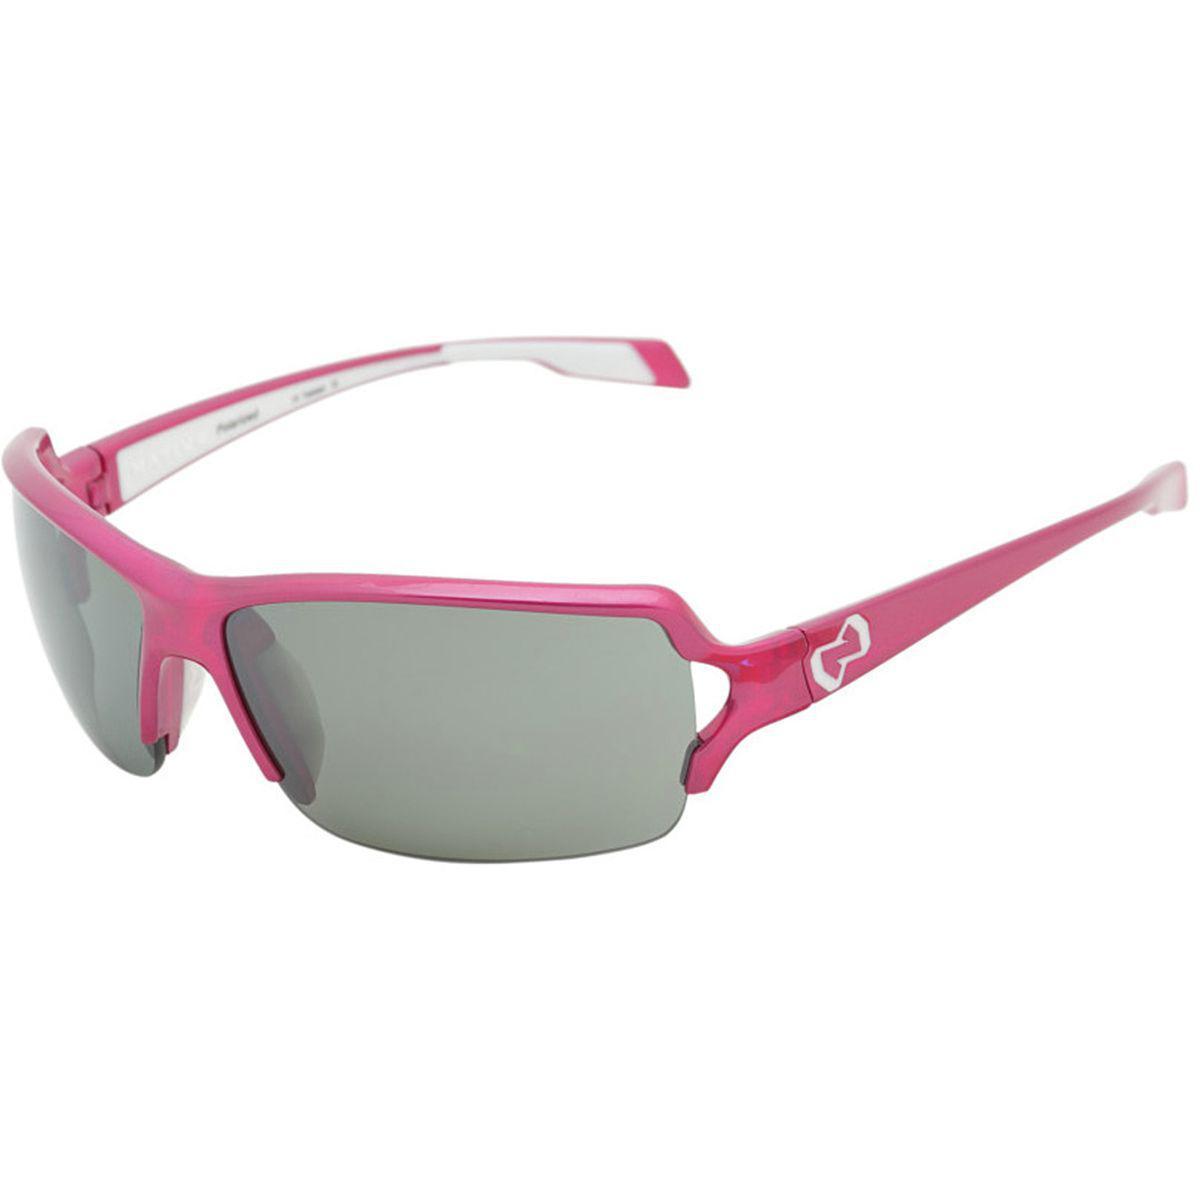 802b12ccd0 Lyst - Native Eyewear Blanca Sunglasses - Polarized